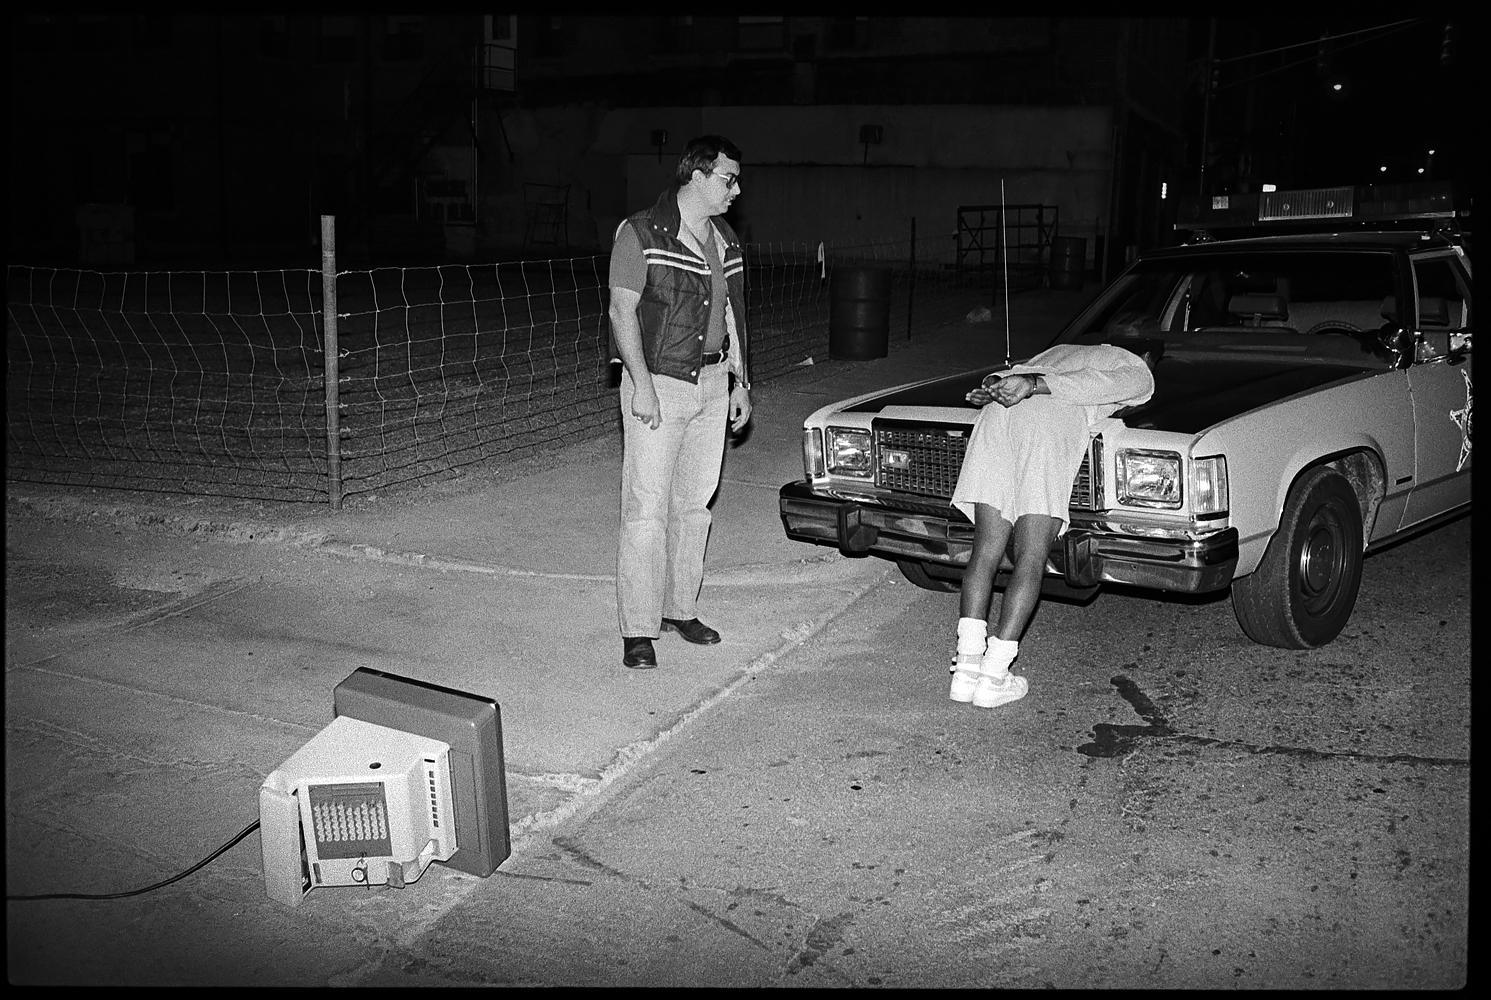 20180119-TC-1982-Muncie_Police_Story-090.jpg